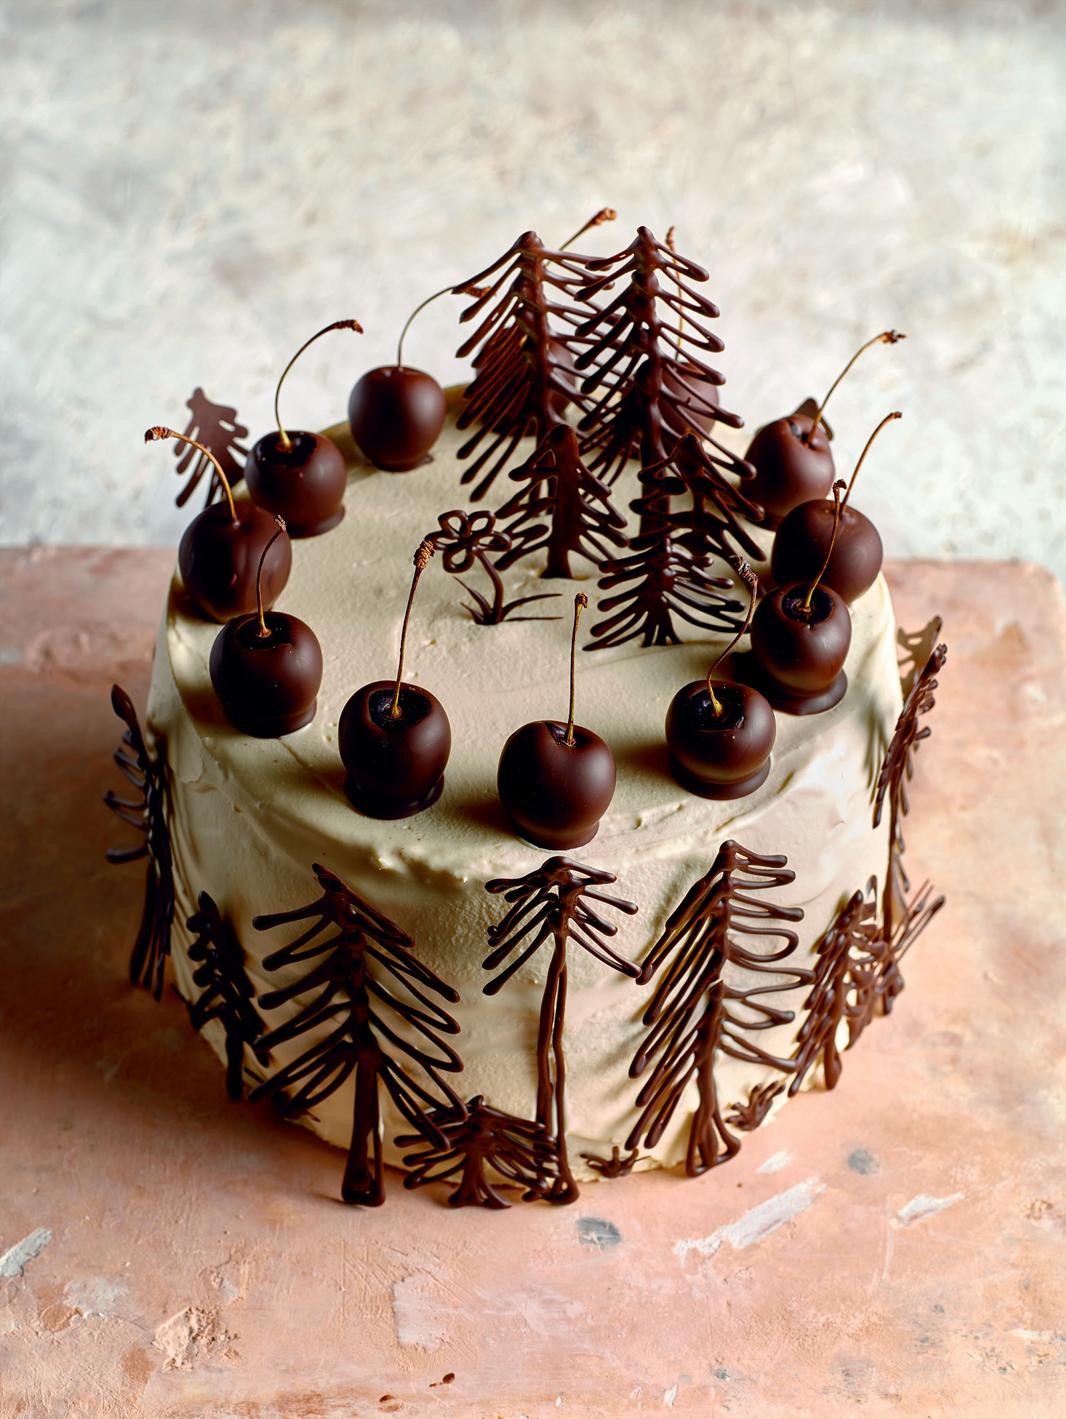 Black forest gateau recipe from B.I.Y. Bake It You